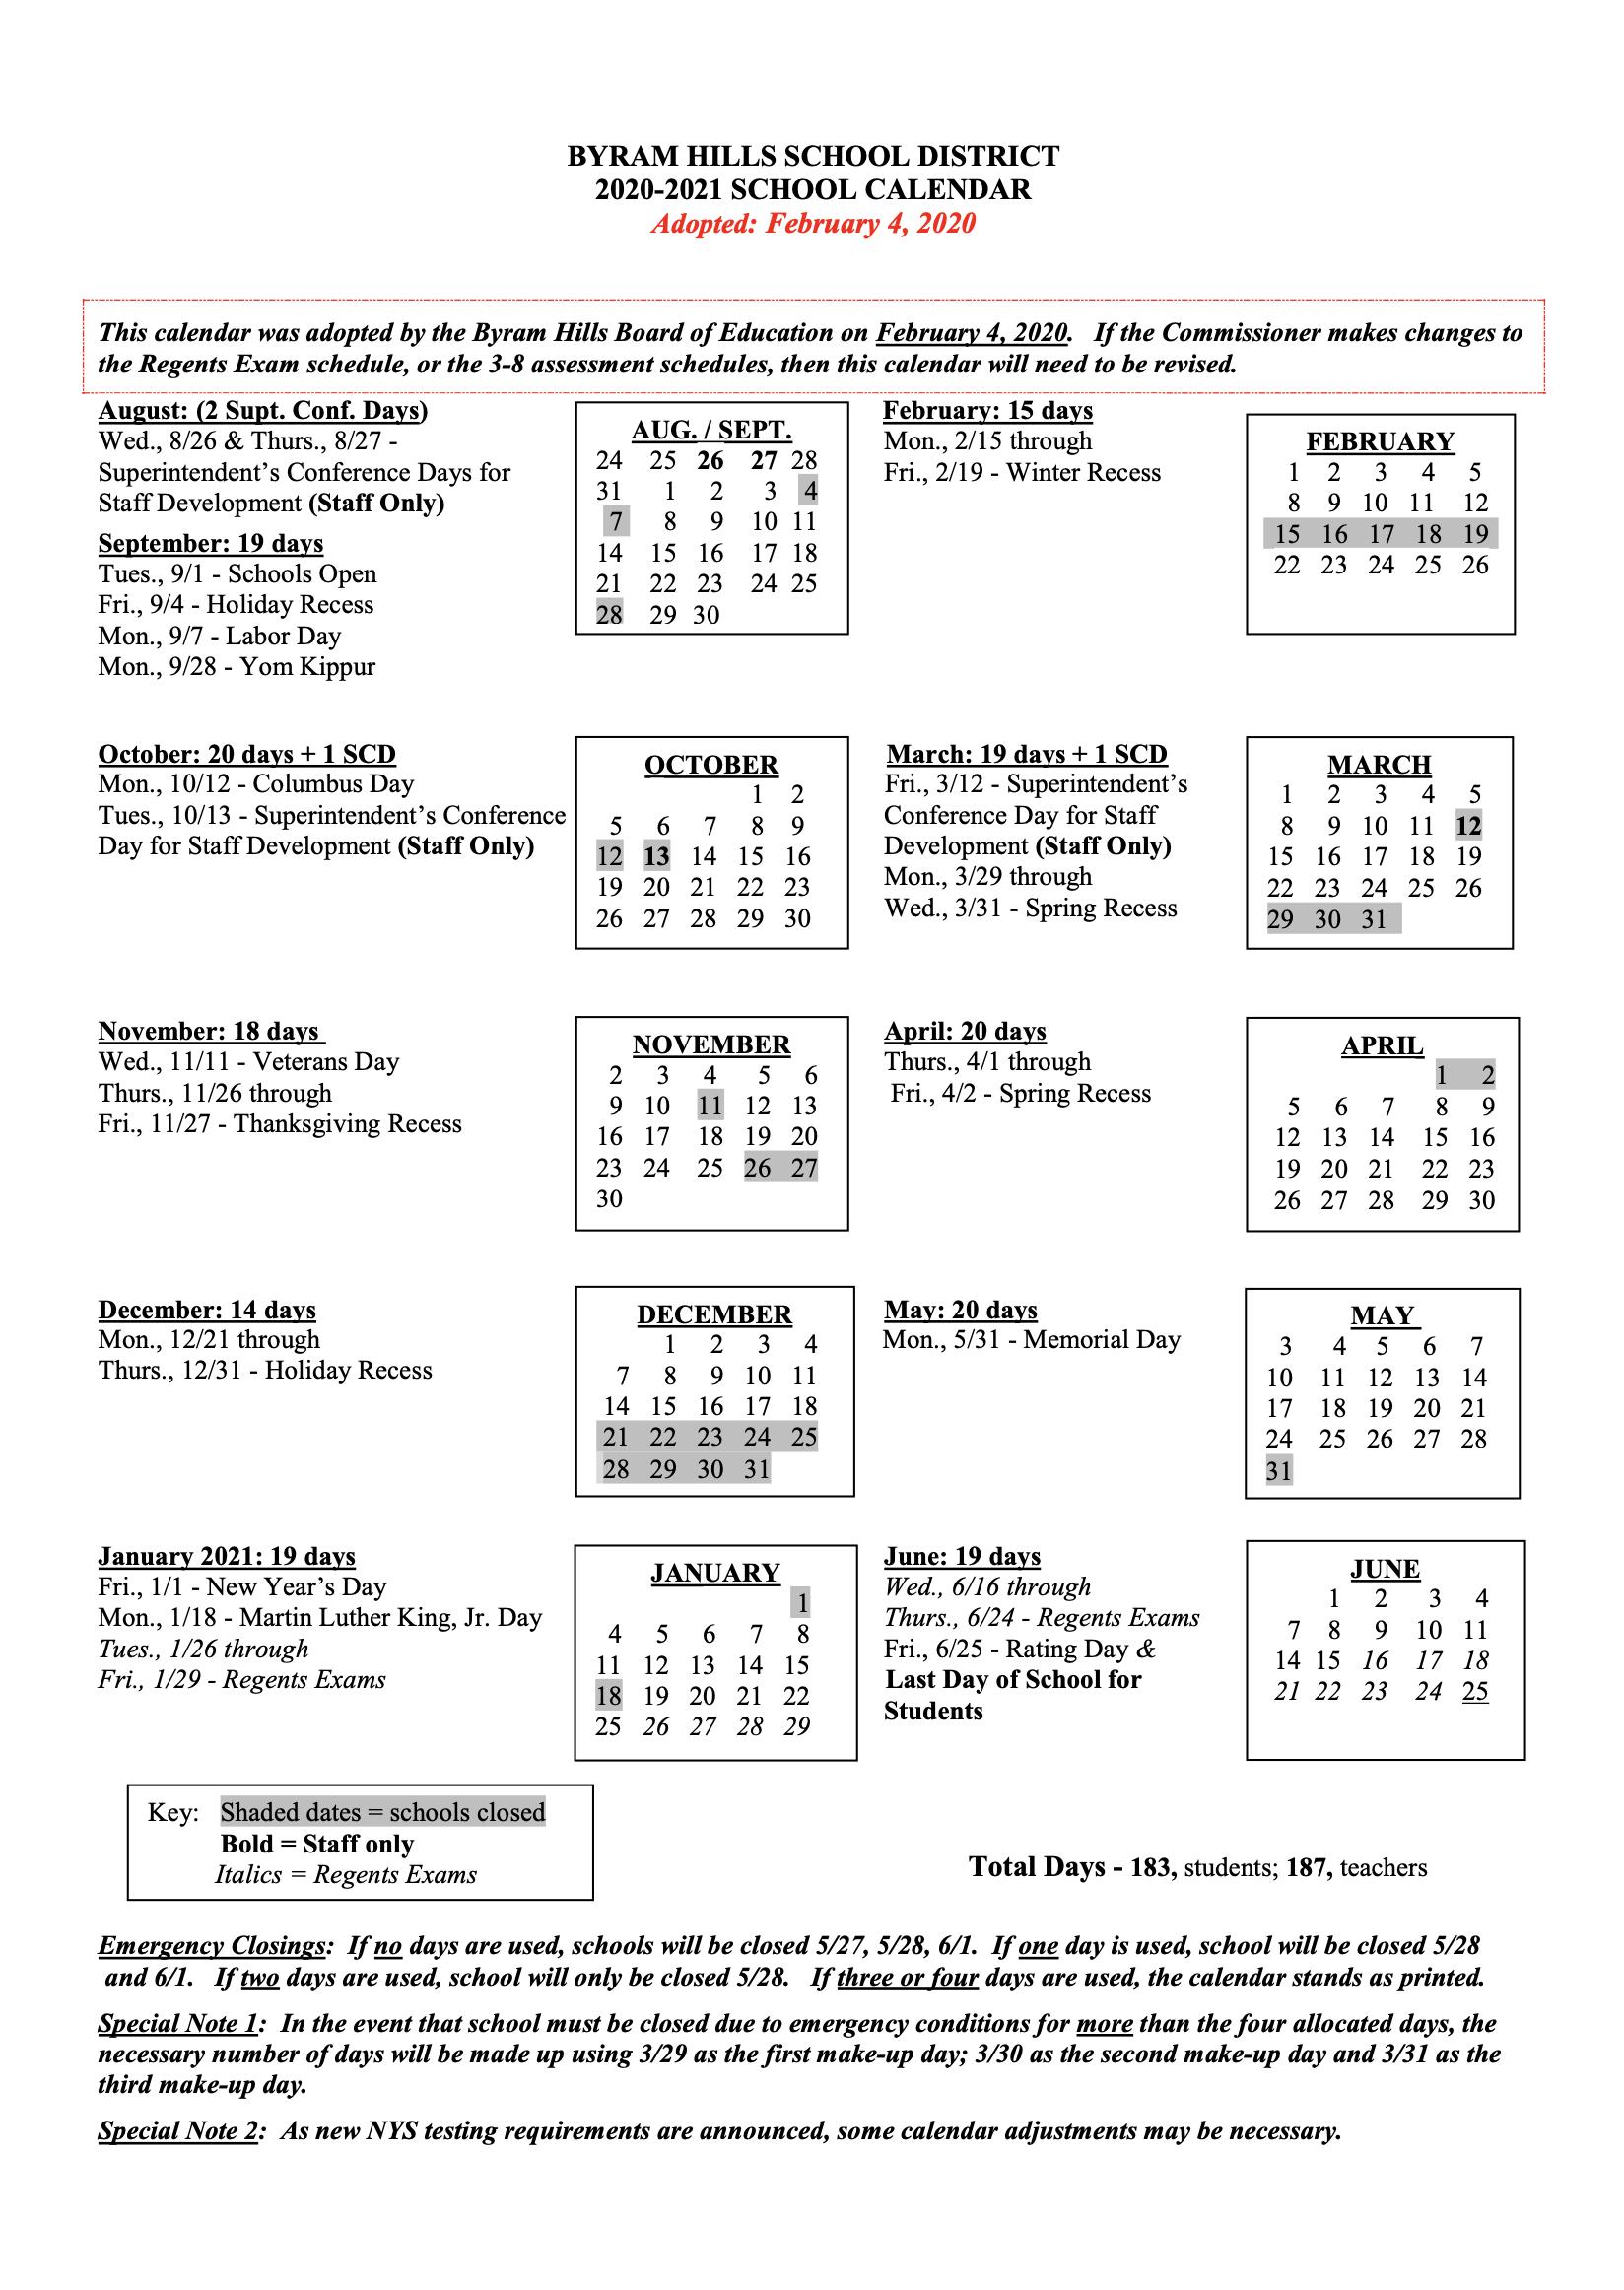 Calendar – Byram Hills Central School District Intended For College Of Staten Island Spring 2021 Calendar